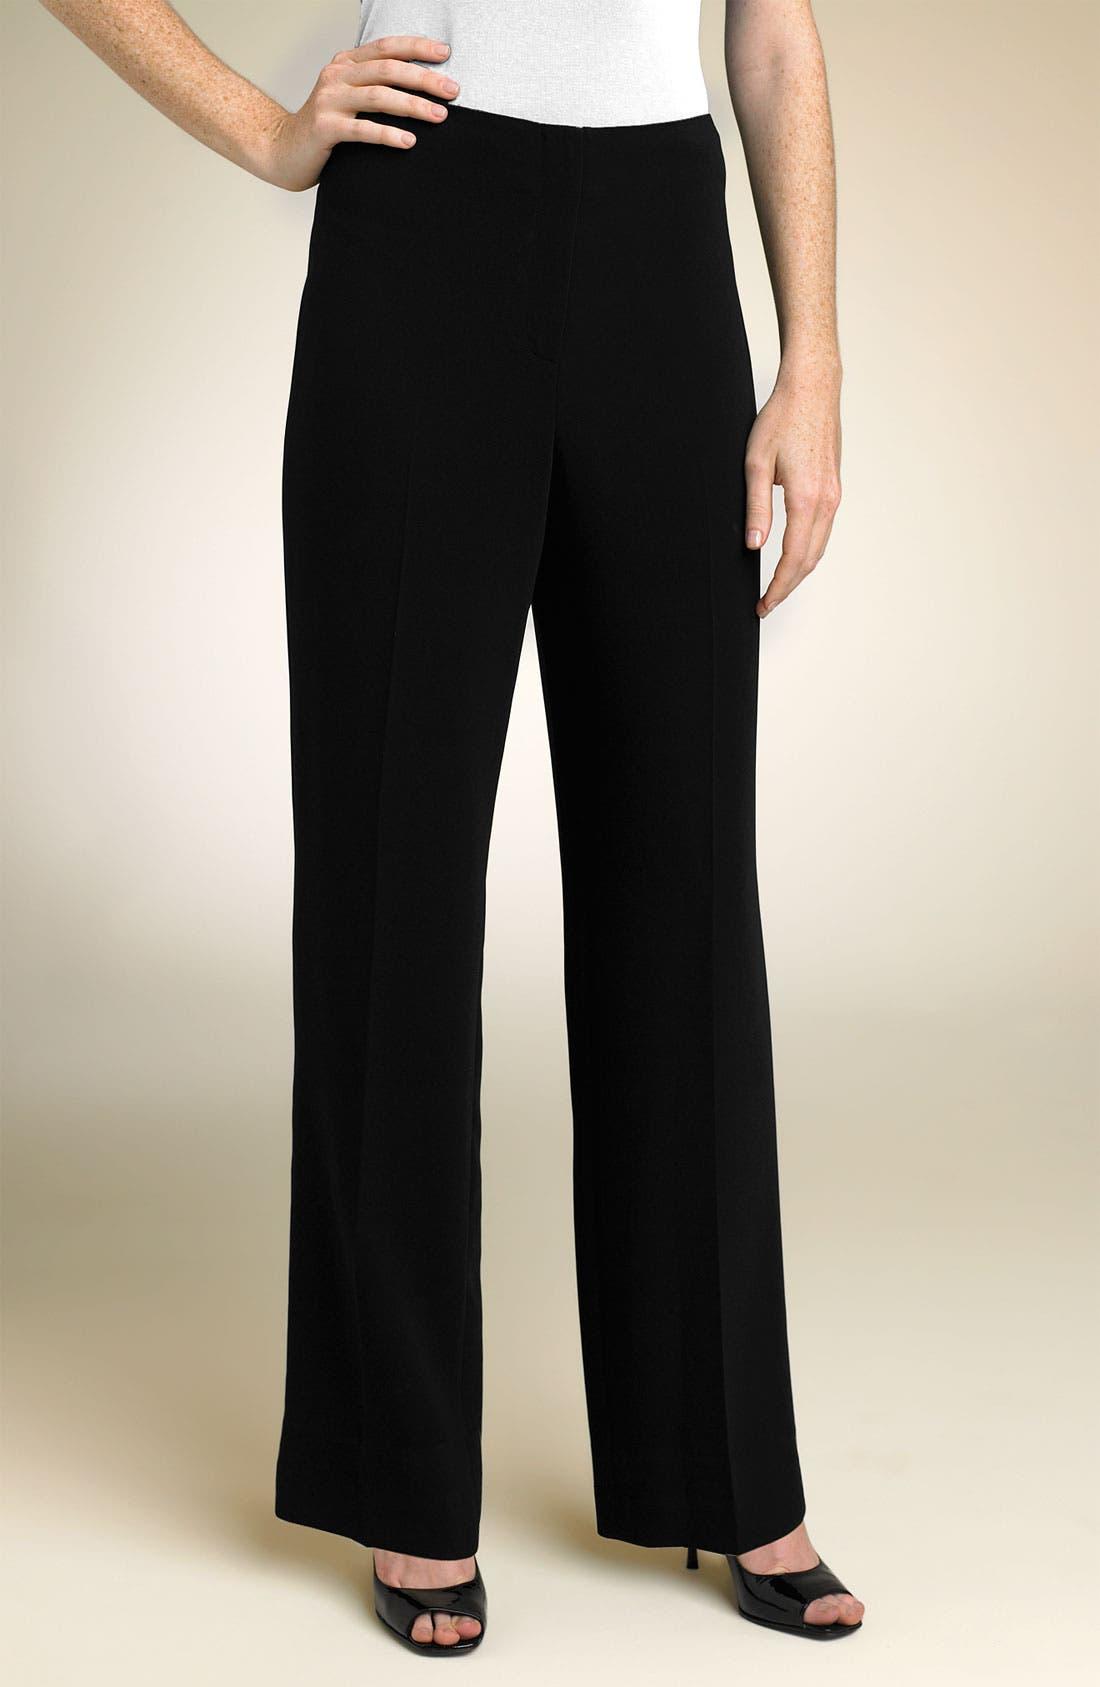 Main Image - Louben Straight Leg Trousers (Petite)